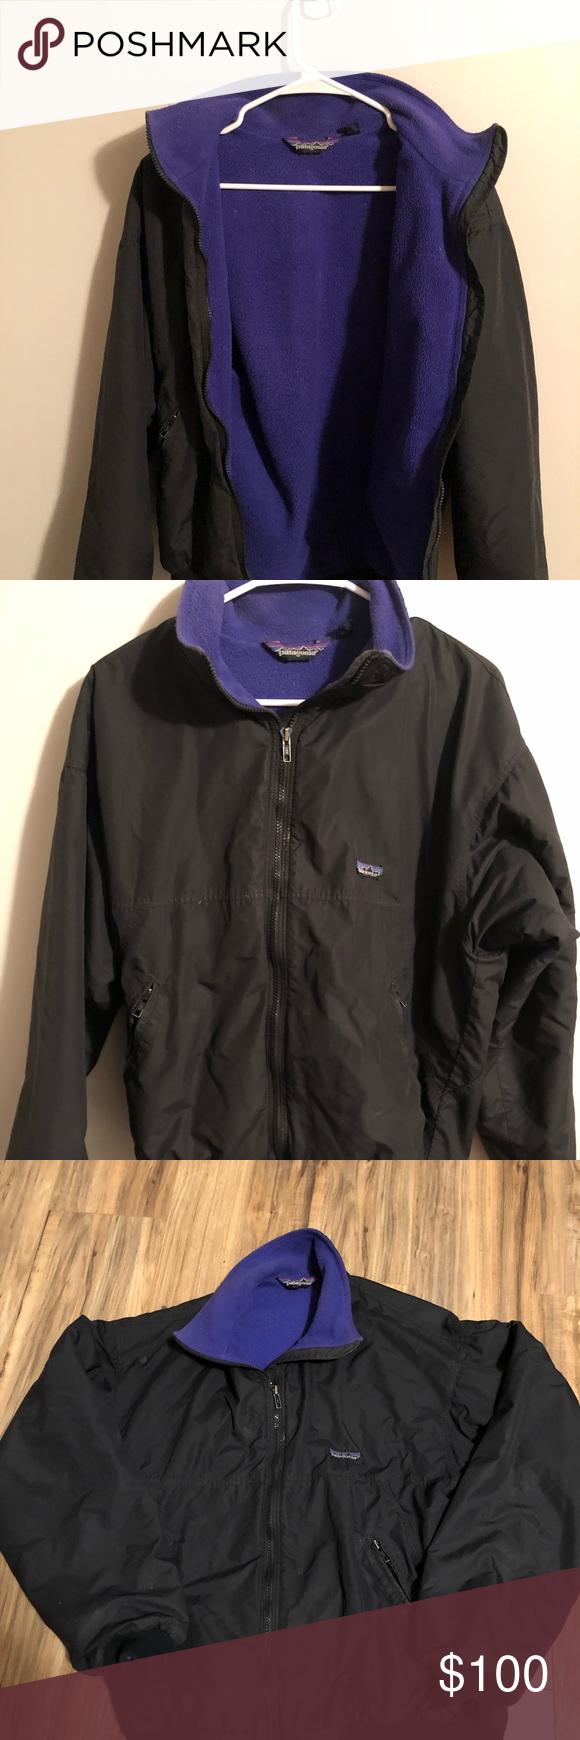 Vintage Patagonia Bomber Jacket Men S Fleece Lined Jacket Patagonia Jackets Coats Bomber Varsity Jackets Clothes Design Vintage Patagonia [ 1740 x 580 Pixel ]